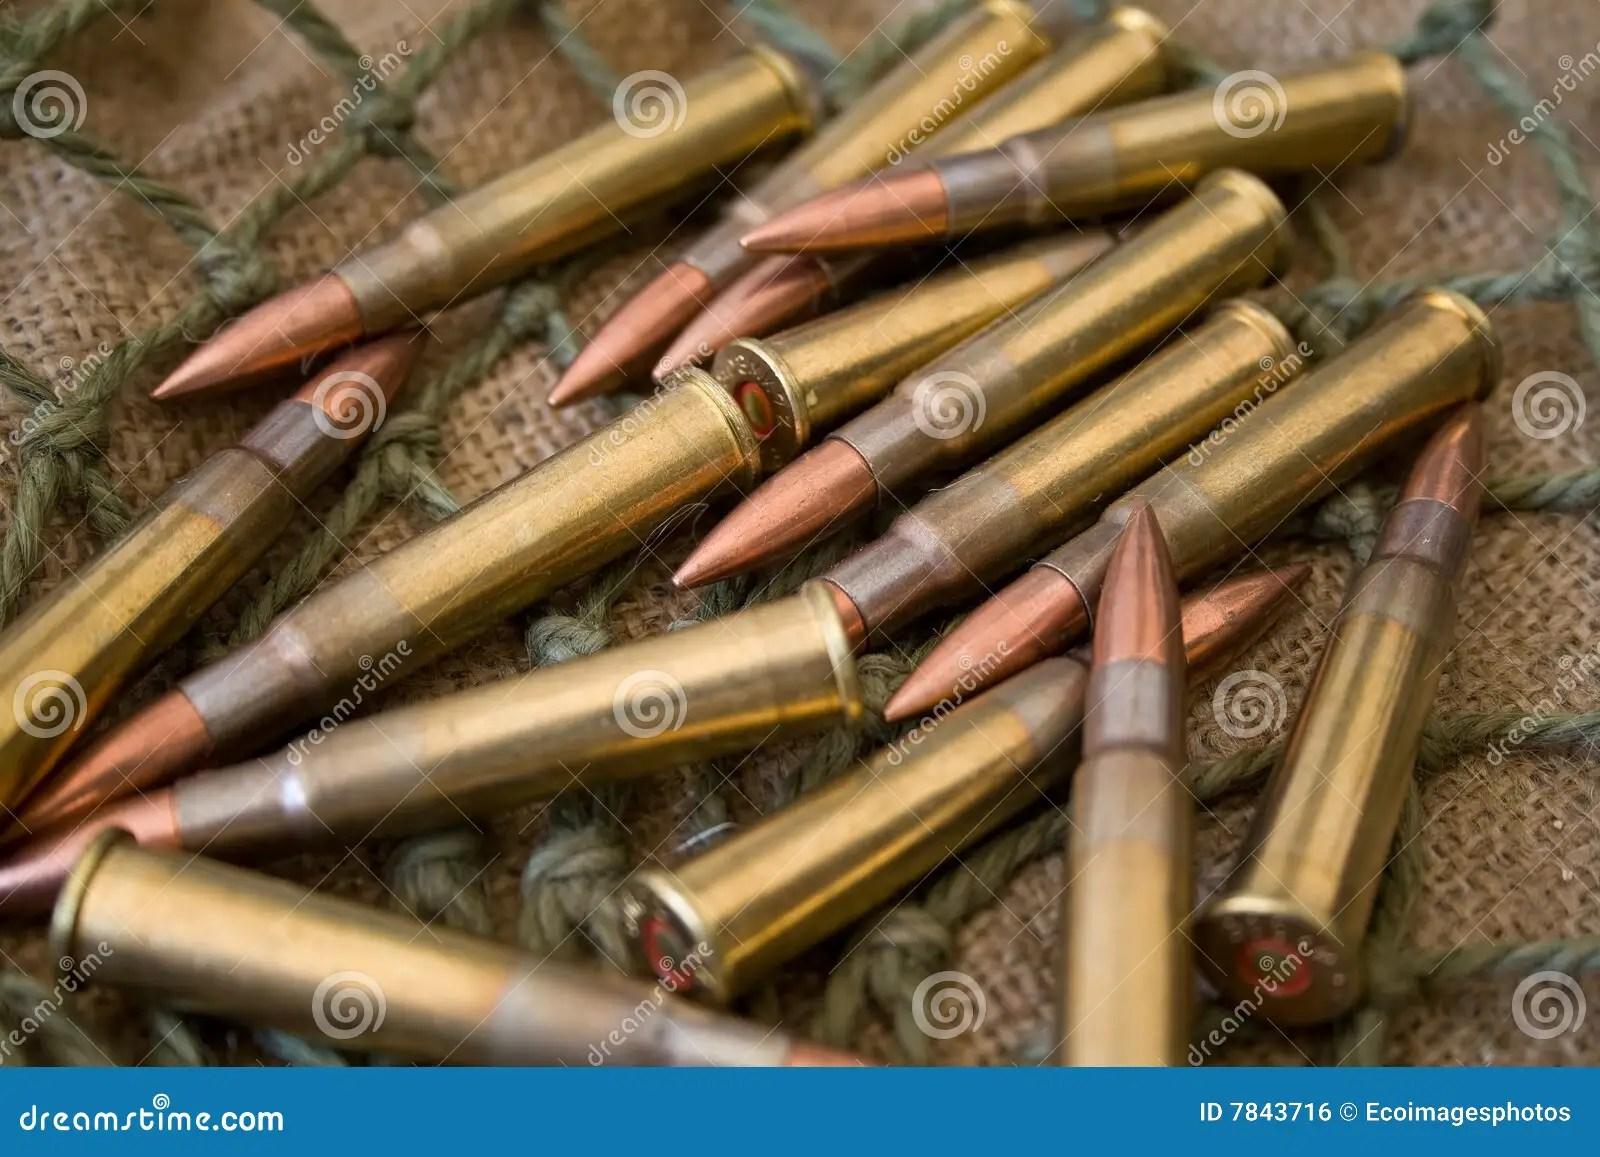 Cuba 3d Wallpaper Ak 47 Ammunition Royalty Free Stock Image Image 7843716